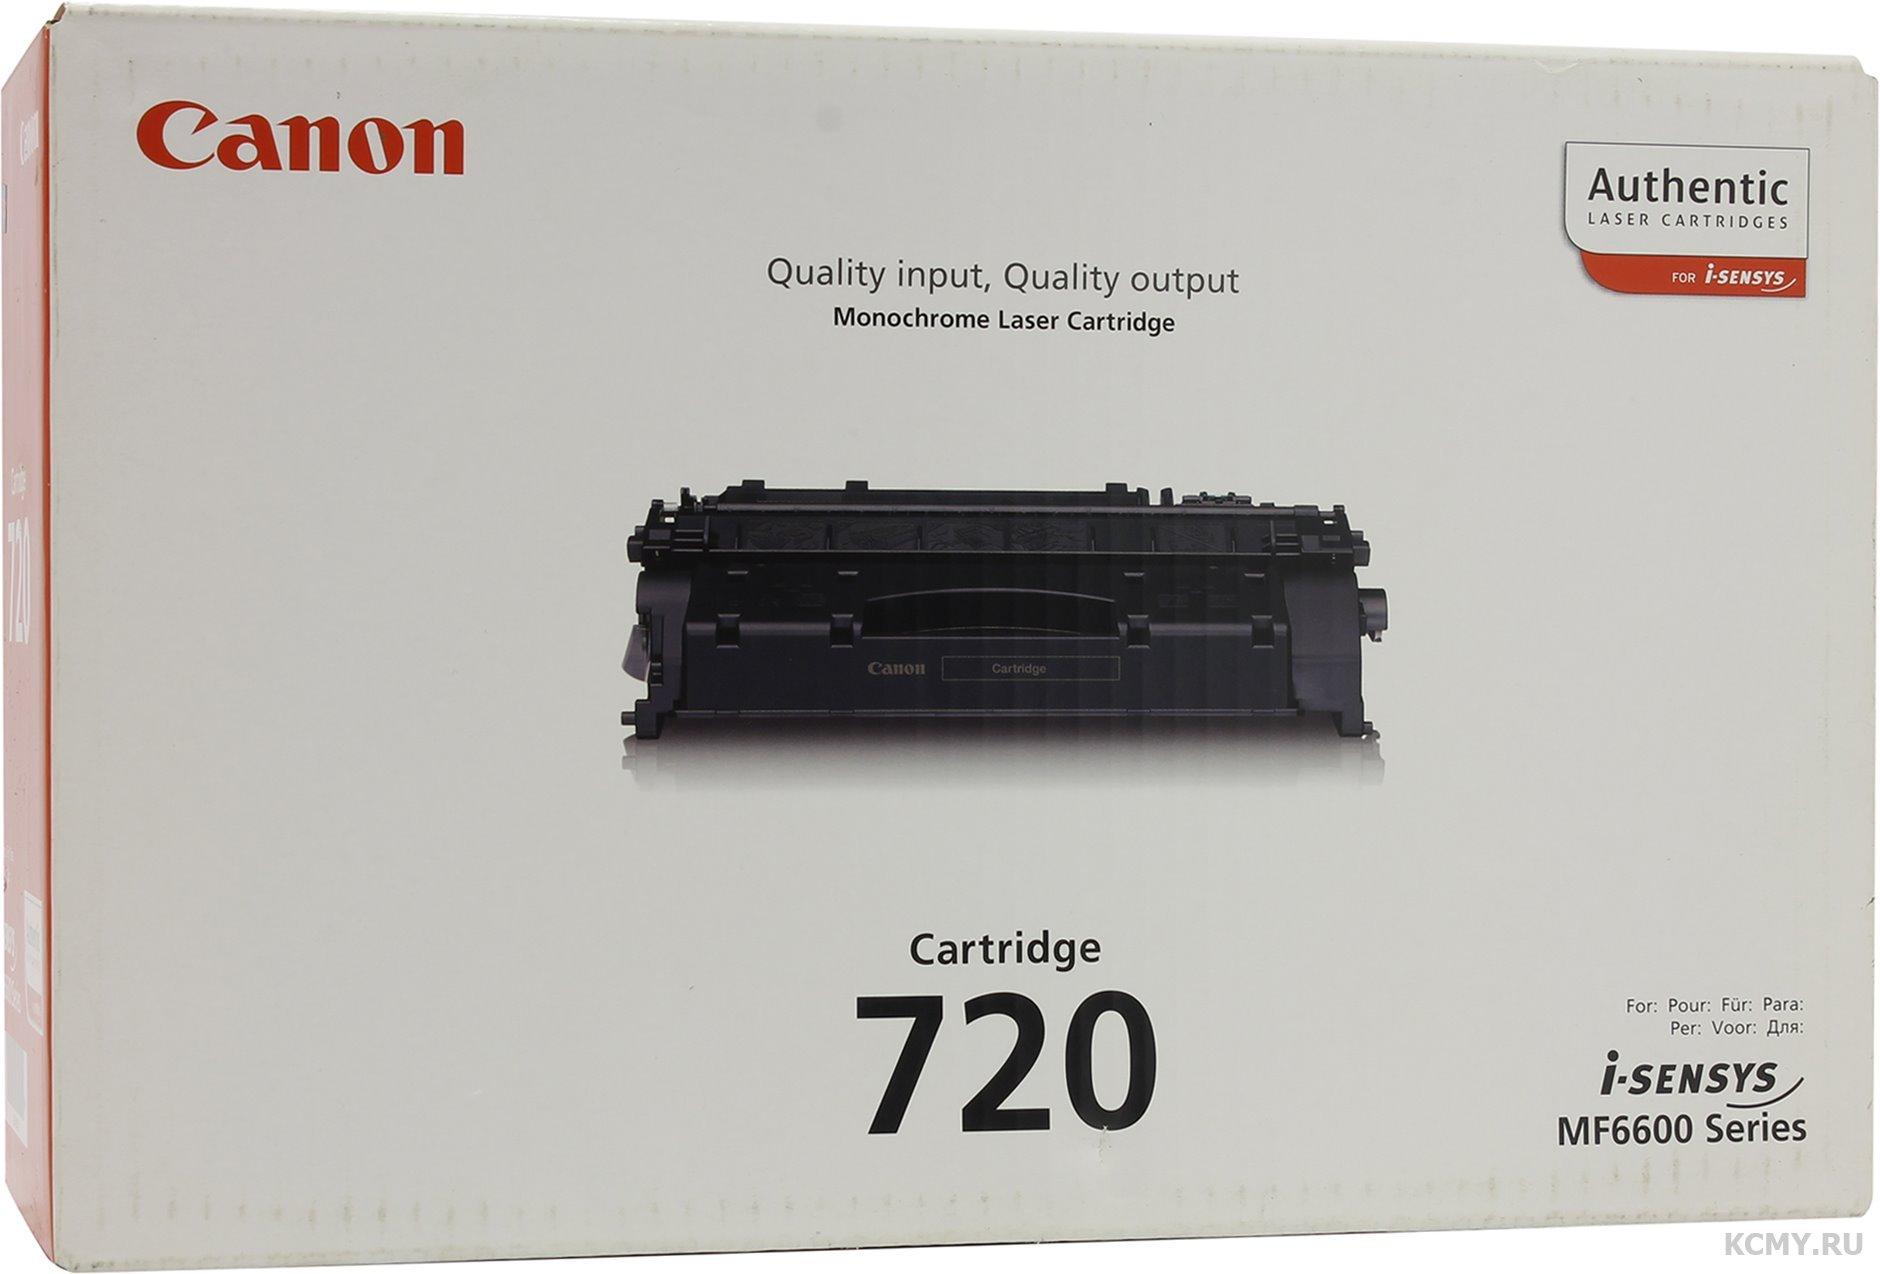 Canon Cartridge 720